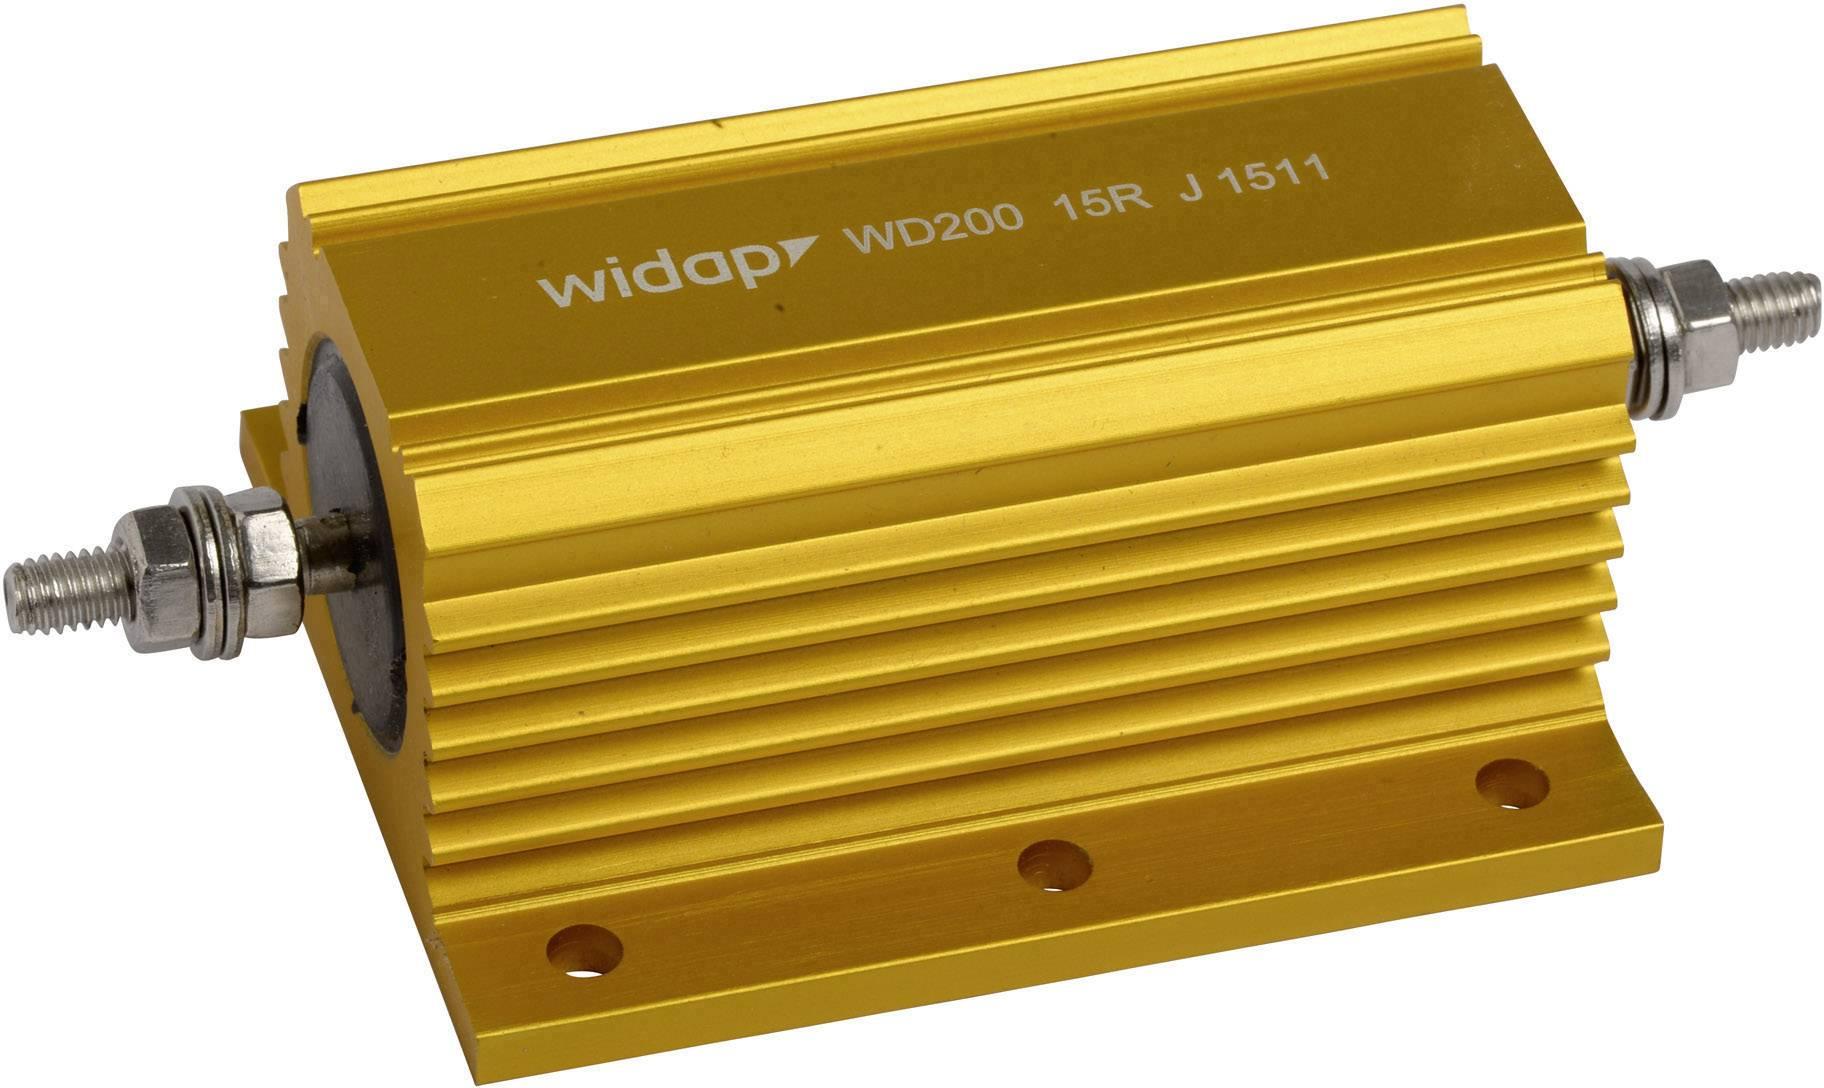 Drôtový rezistor Widap 160152, hodnota odporu 22 Ohm, 200 W, 1 ks